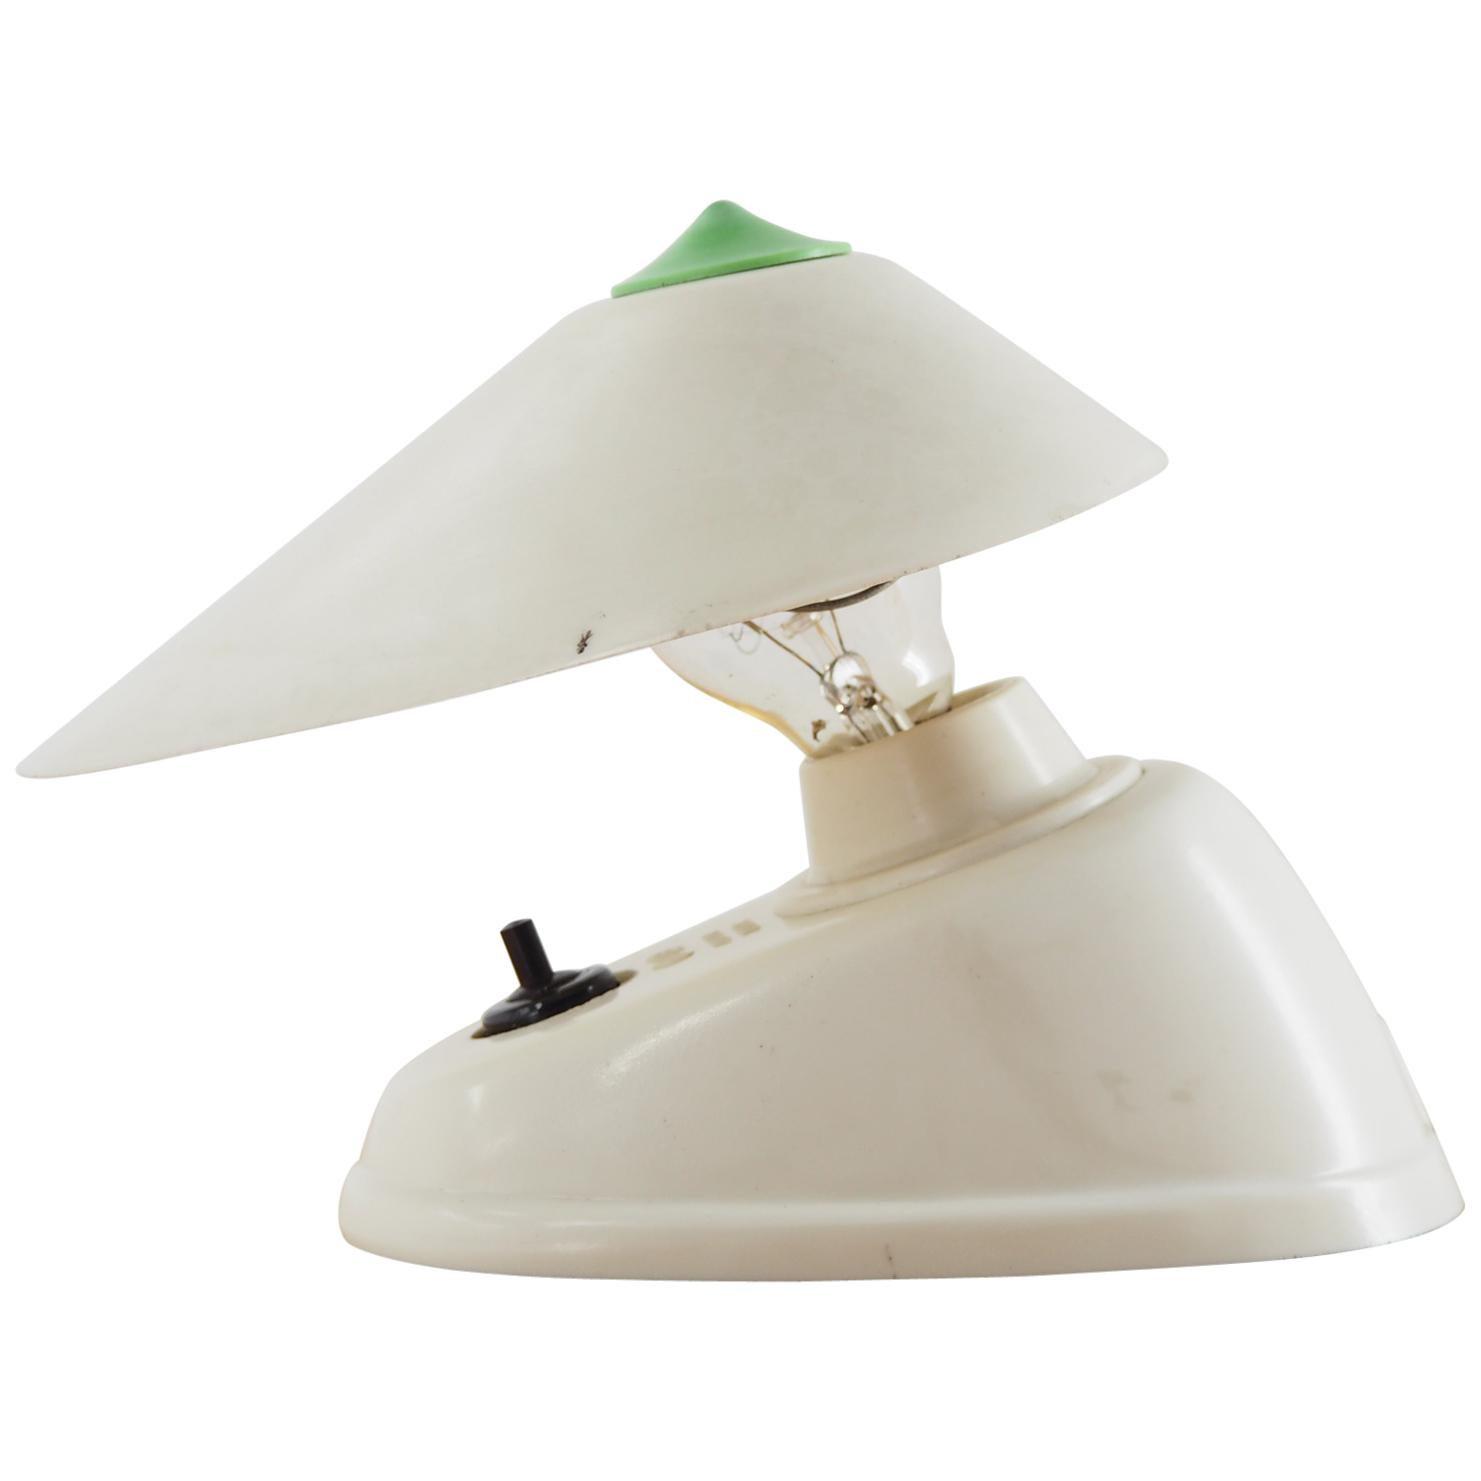 Midcentury White Bakelite Table or Wall Lamp, 1960s